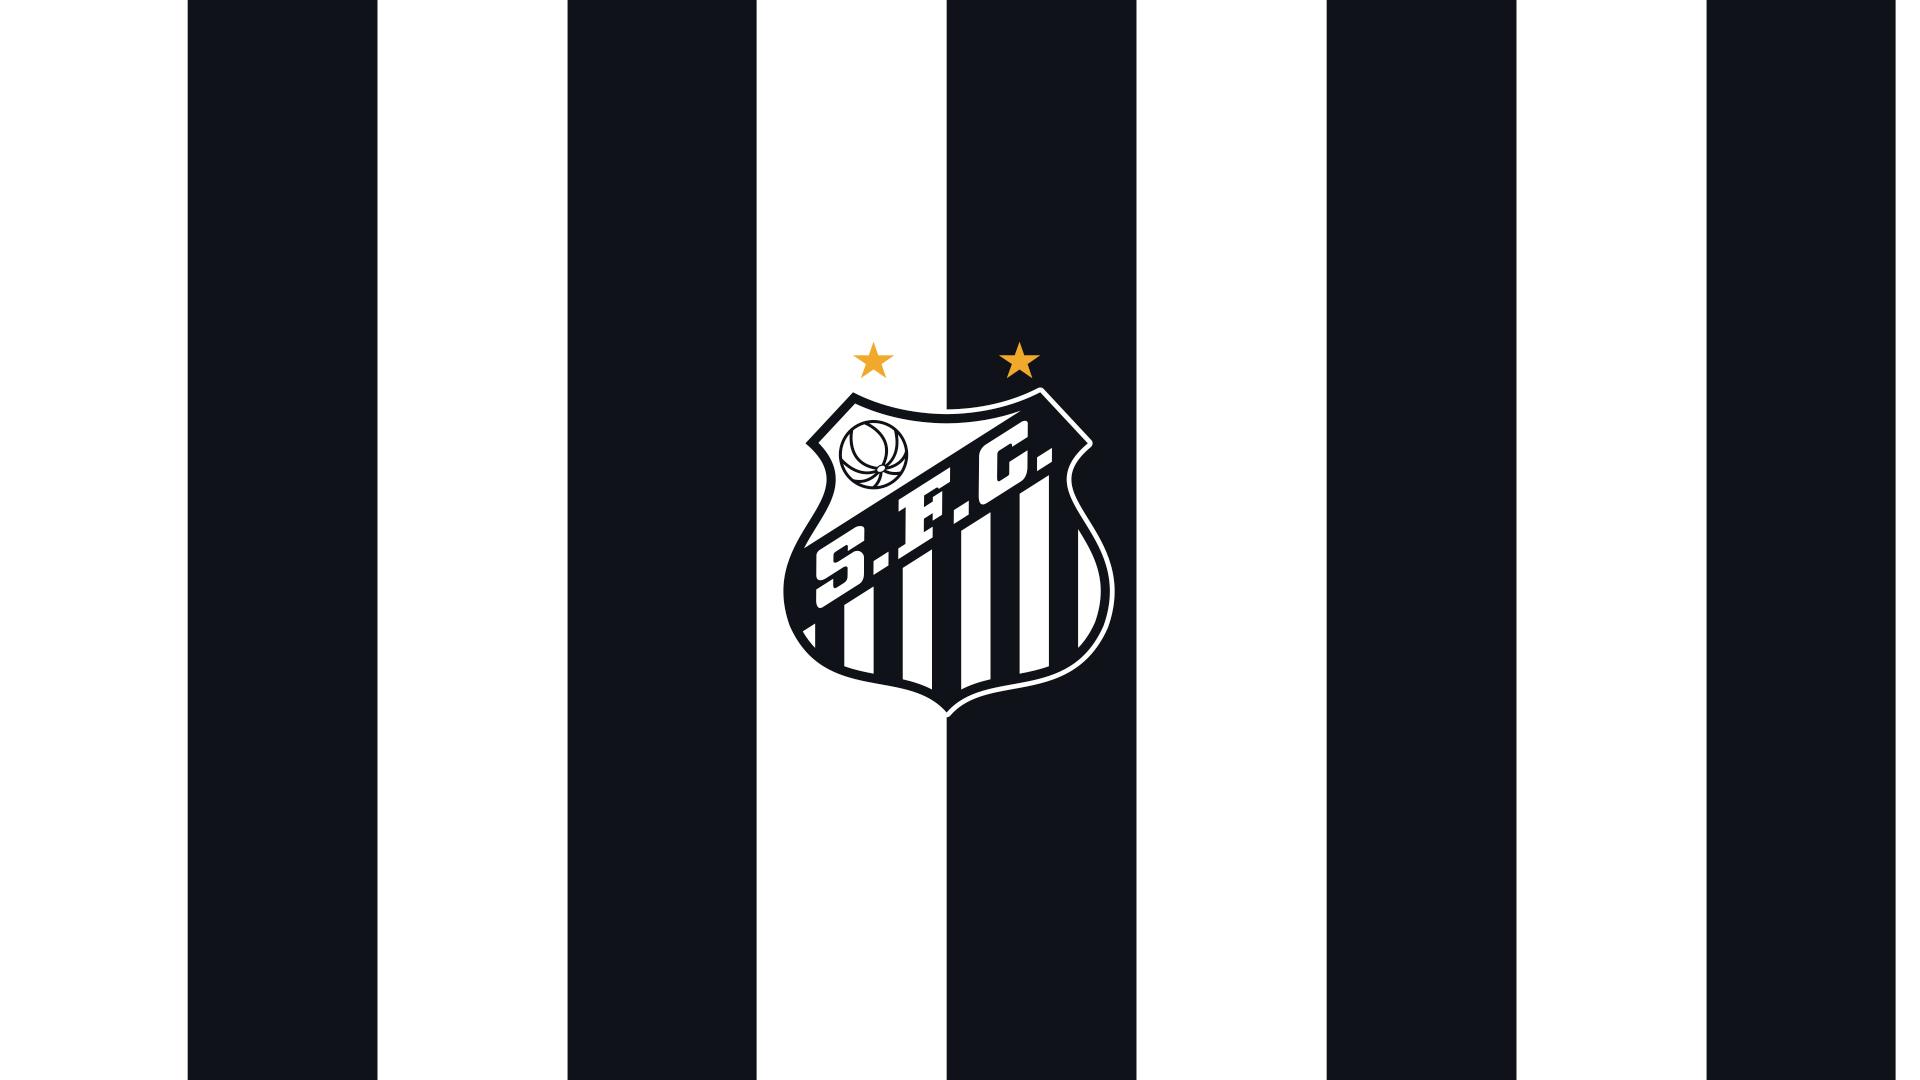 Best 36 Wallpaper Santos on HipWallpaper Santos Futebol Clube 1920x1080